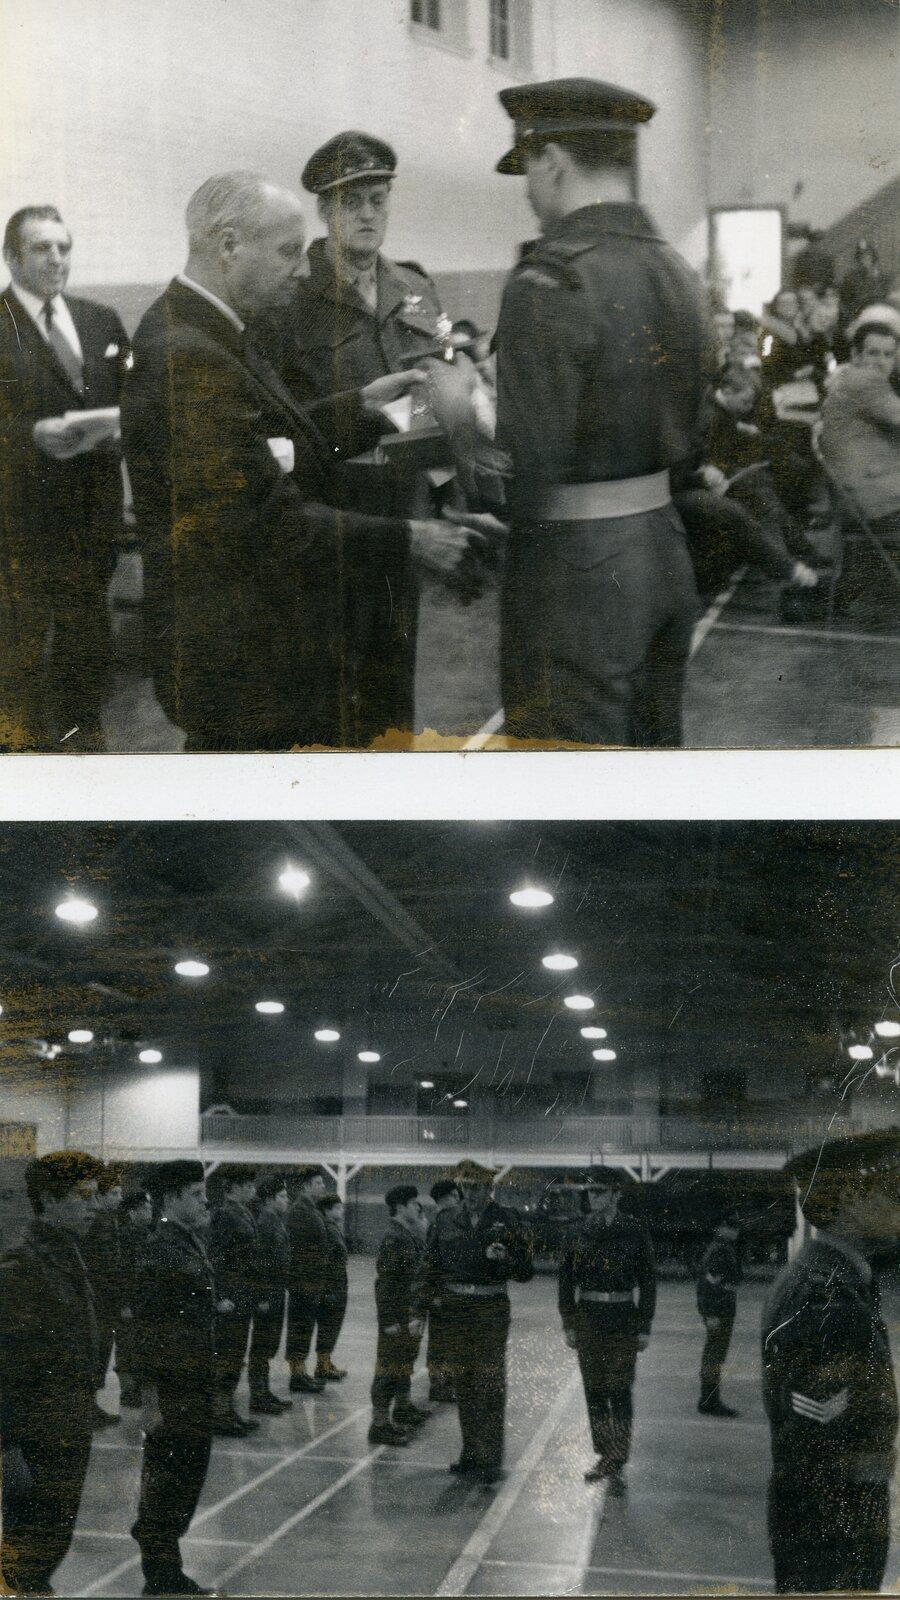 Bill Scott Ceremony at Armories